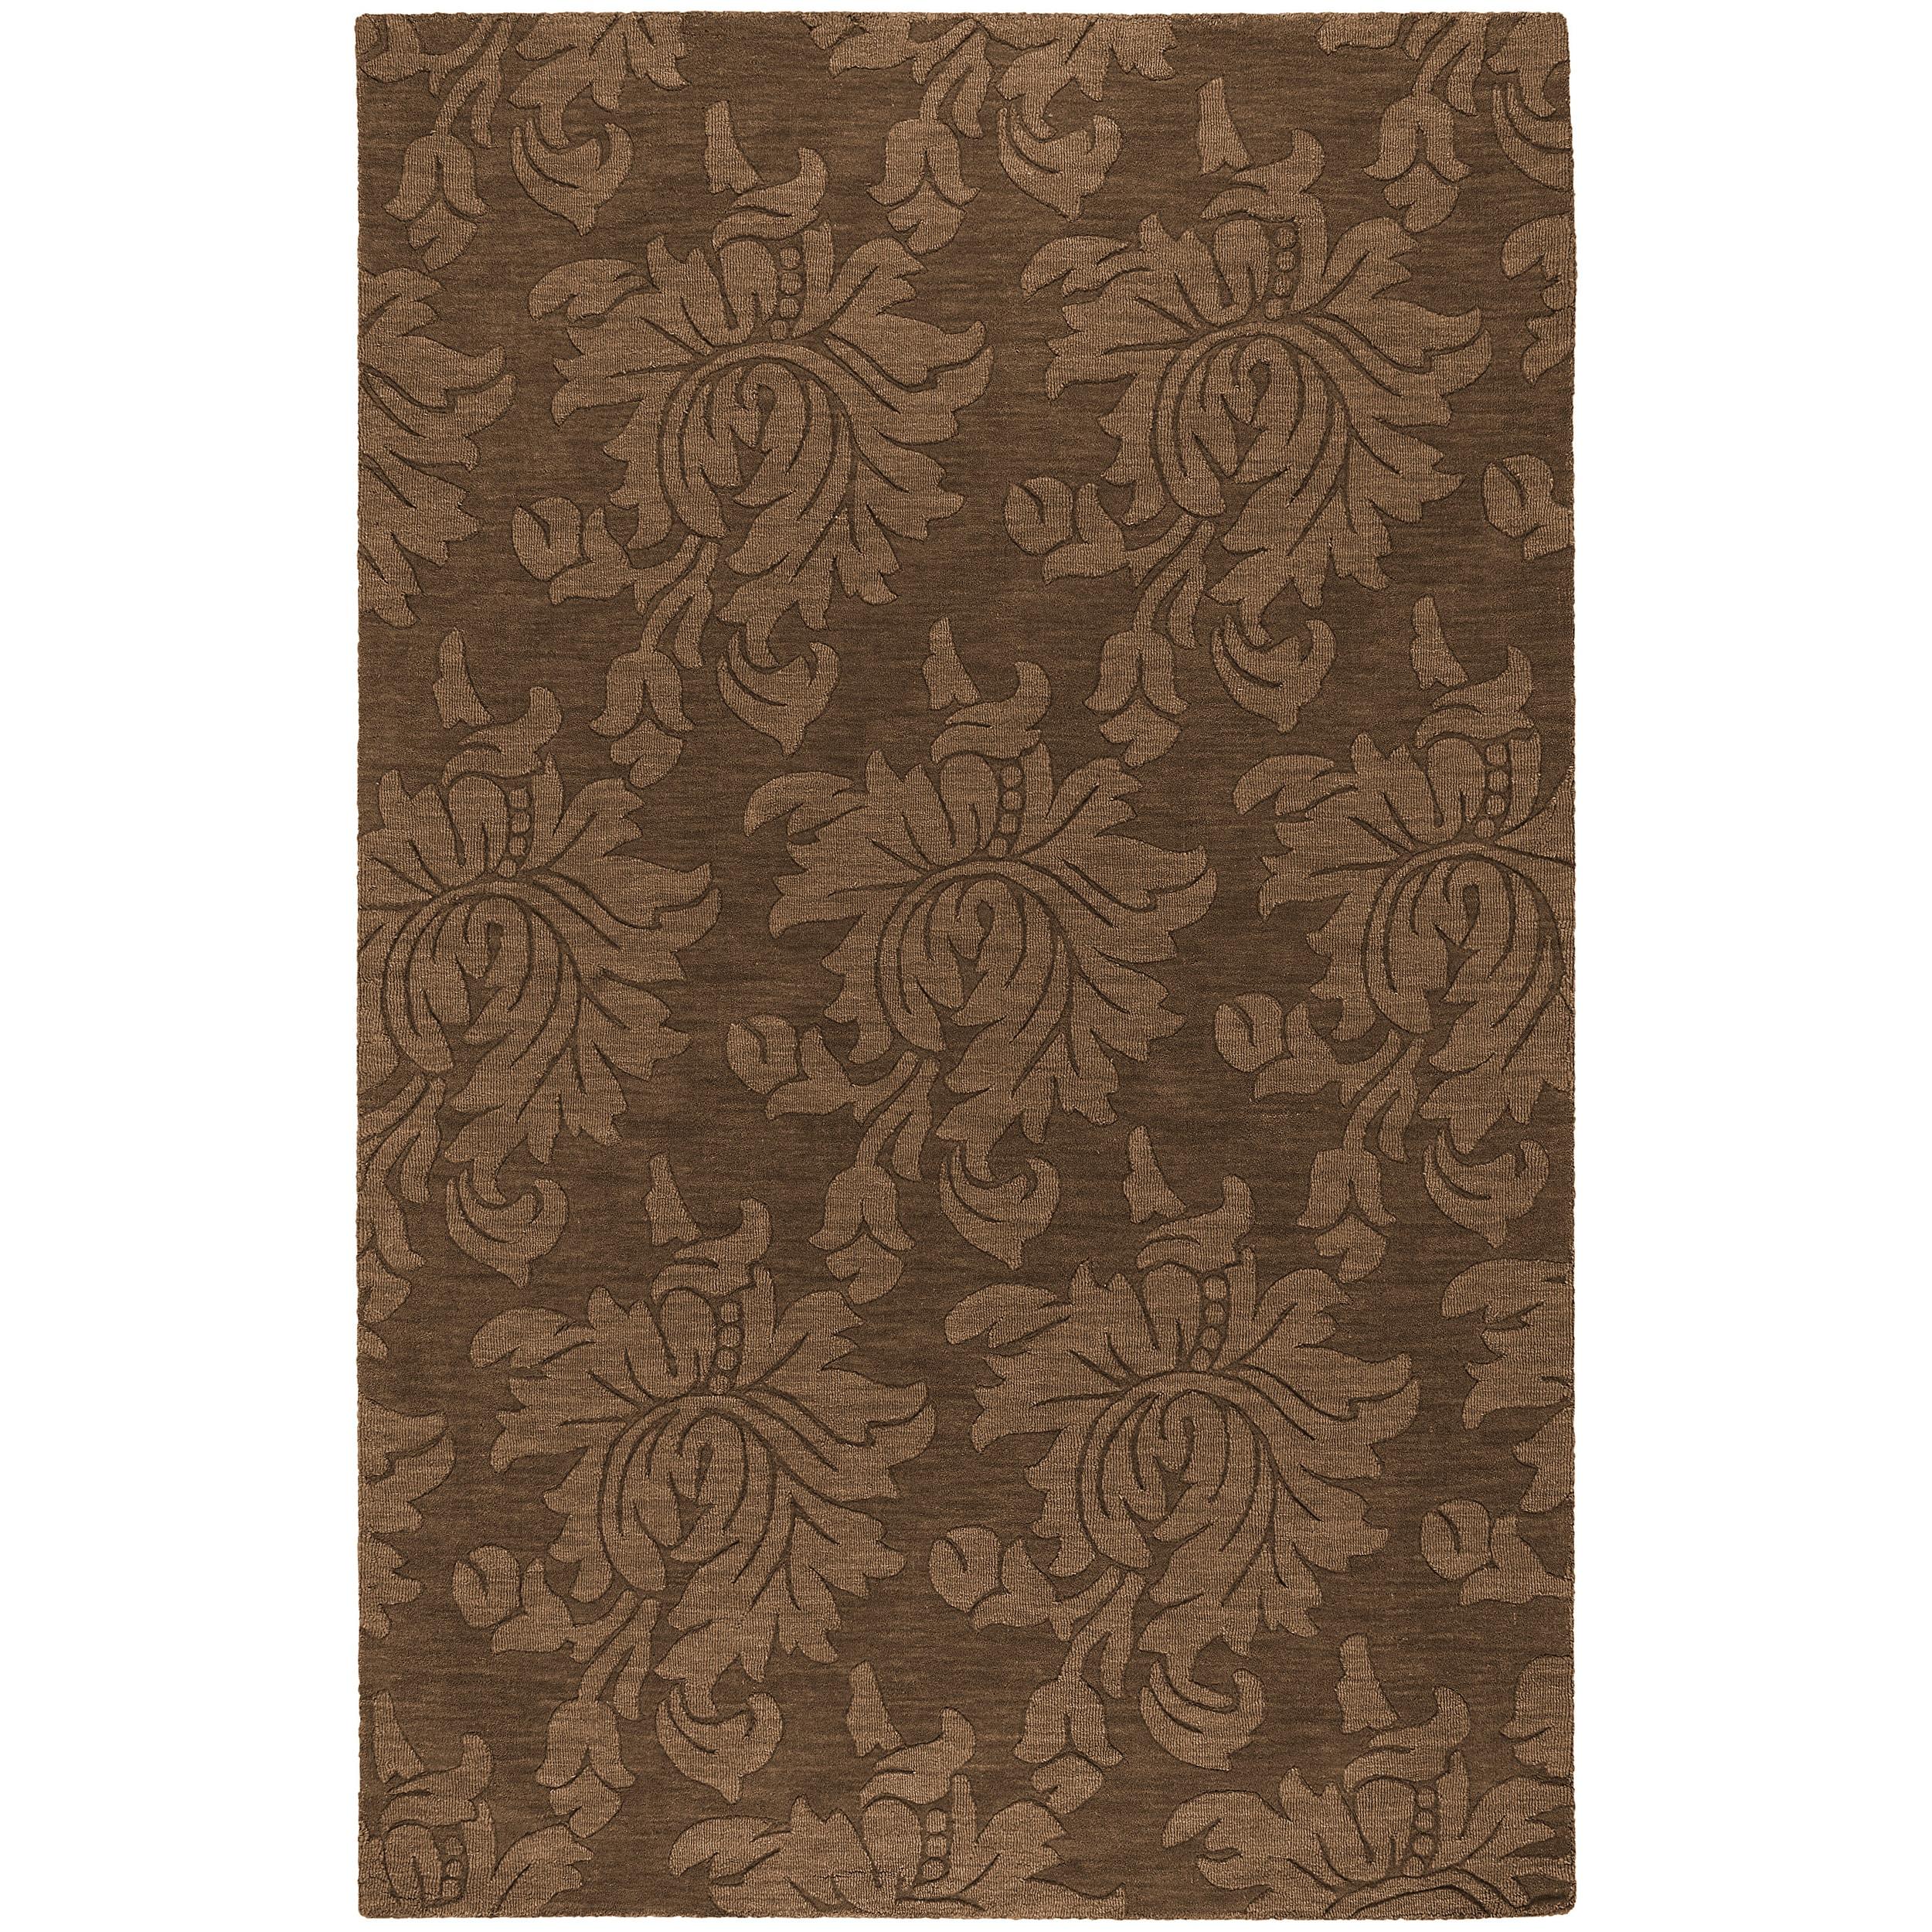 Hand tufted Sophia Brown Wool Area Rug (9' x 12')